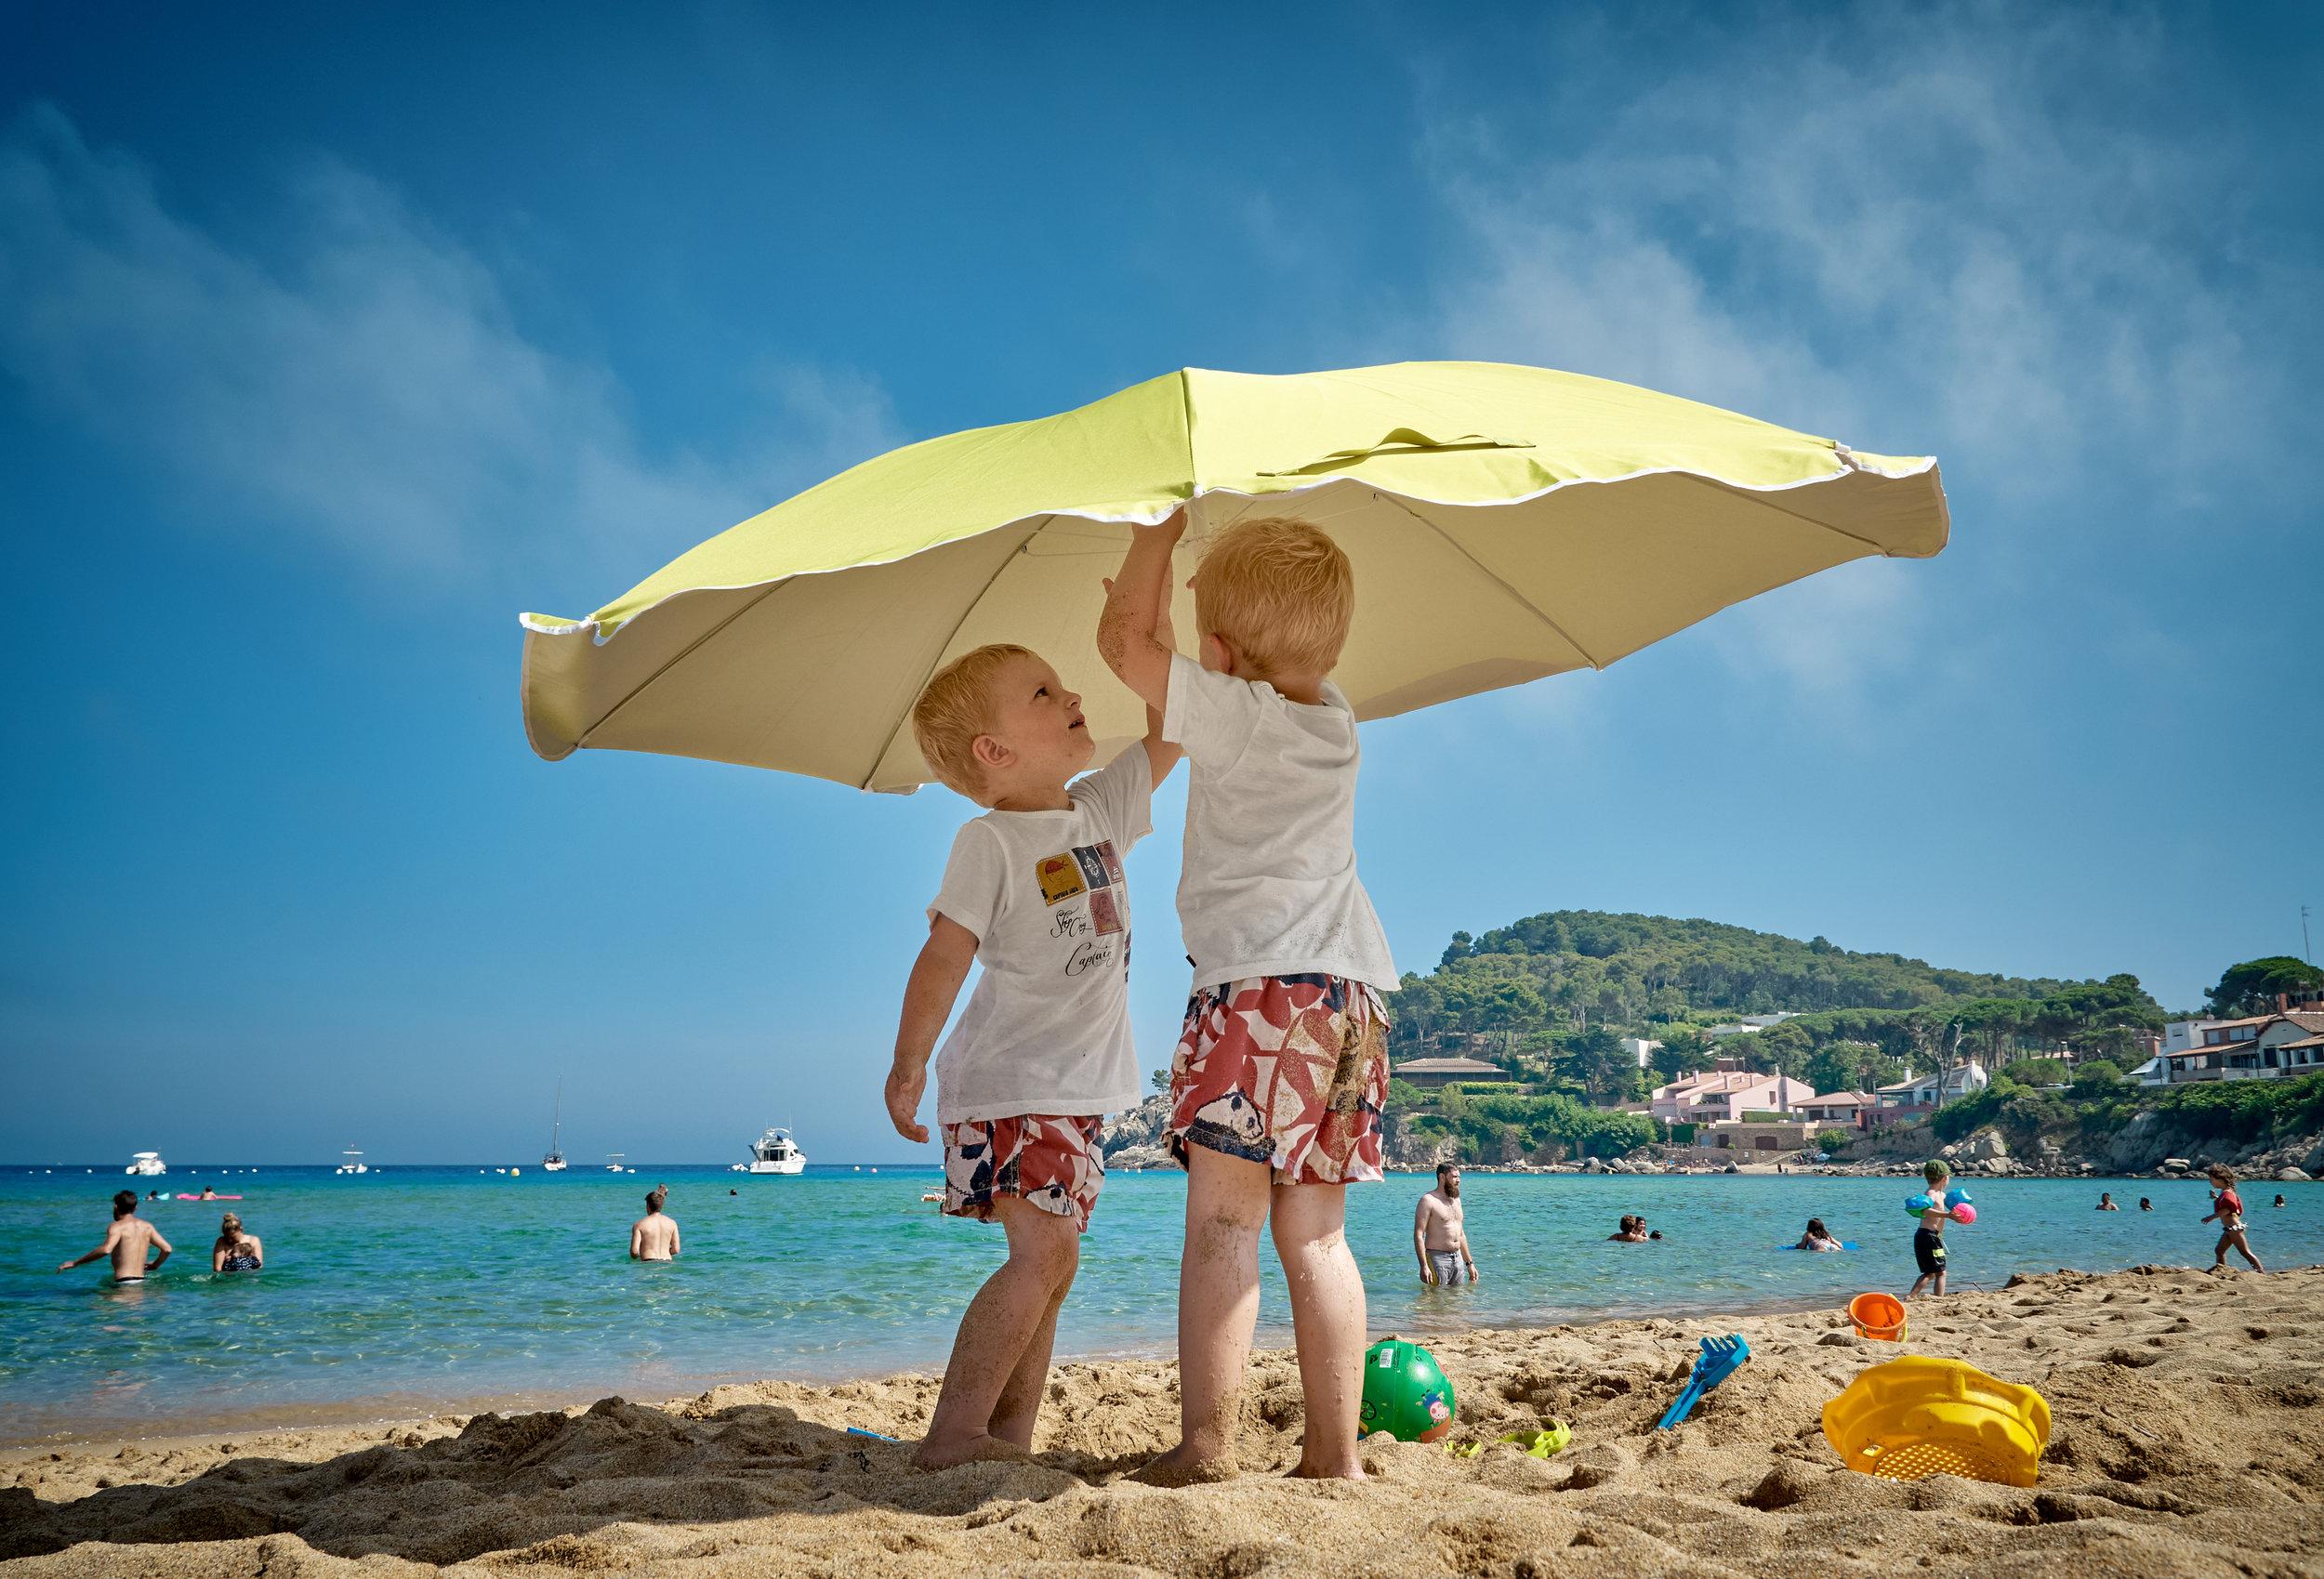 twin boys on a beach with yellow umbrella